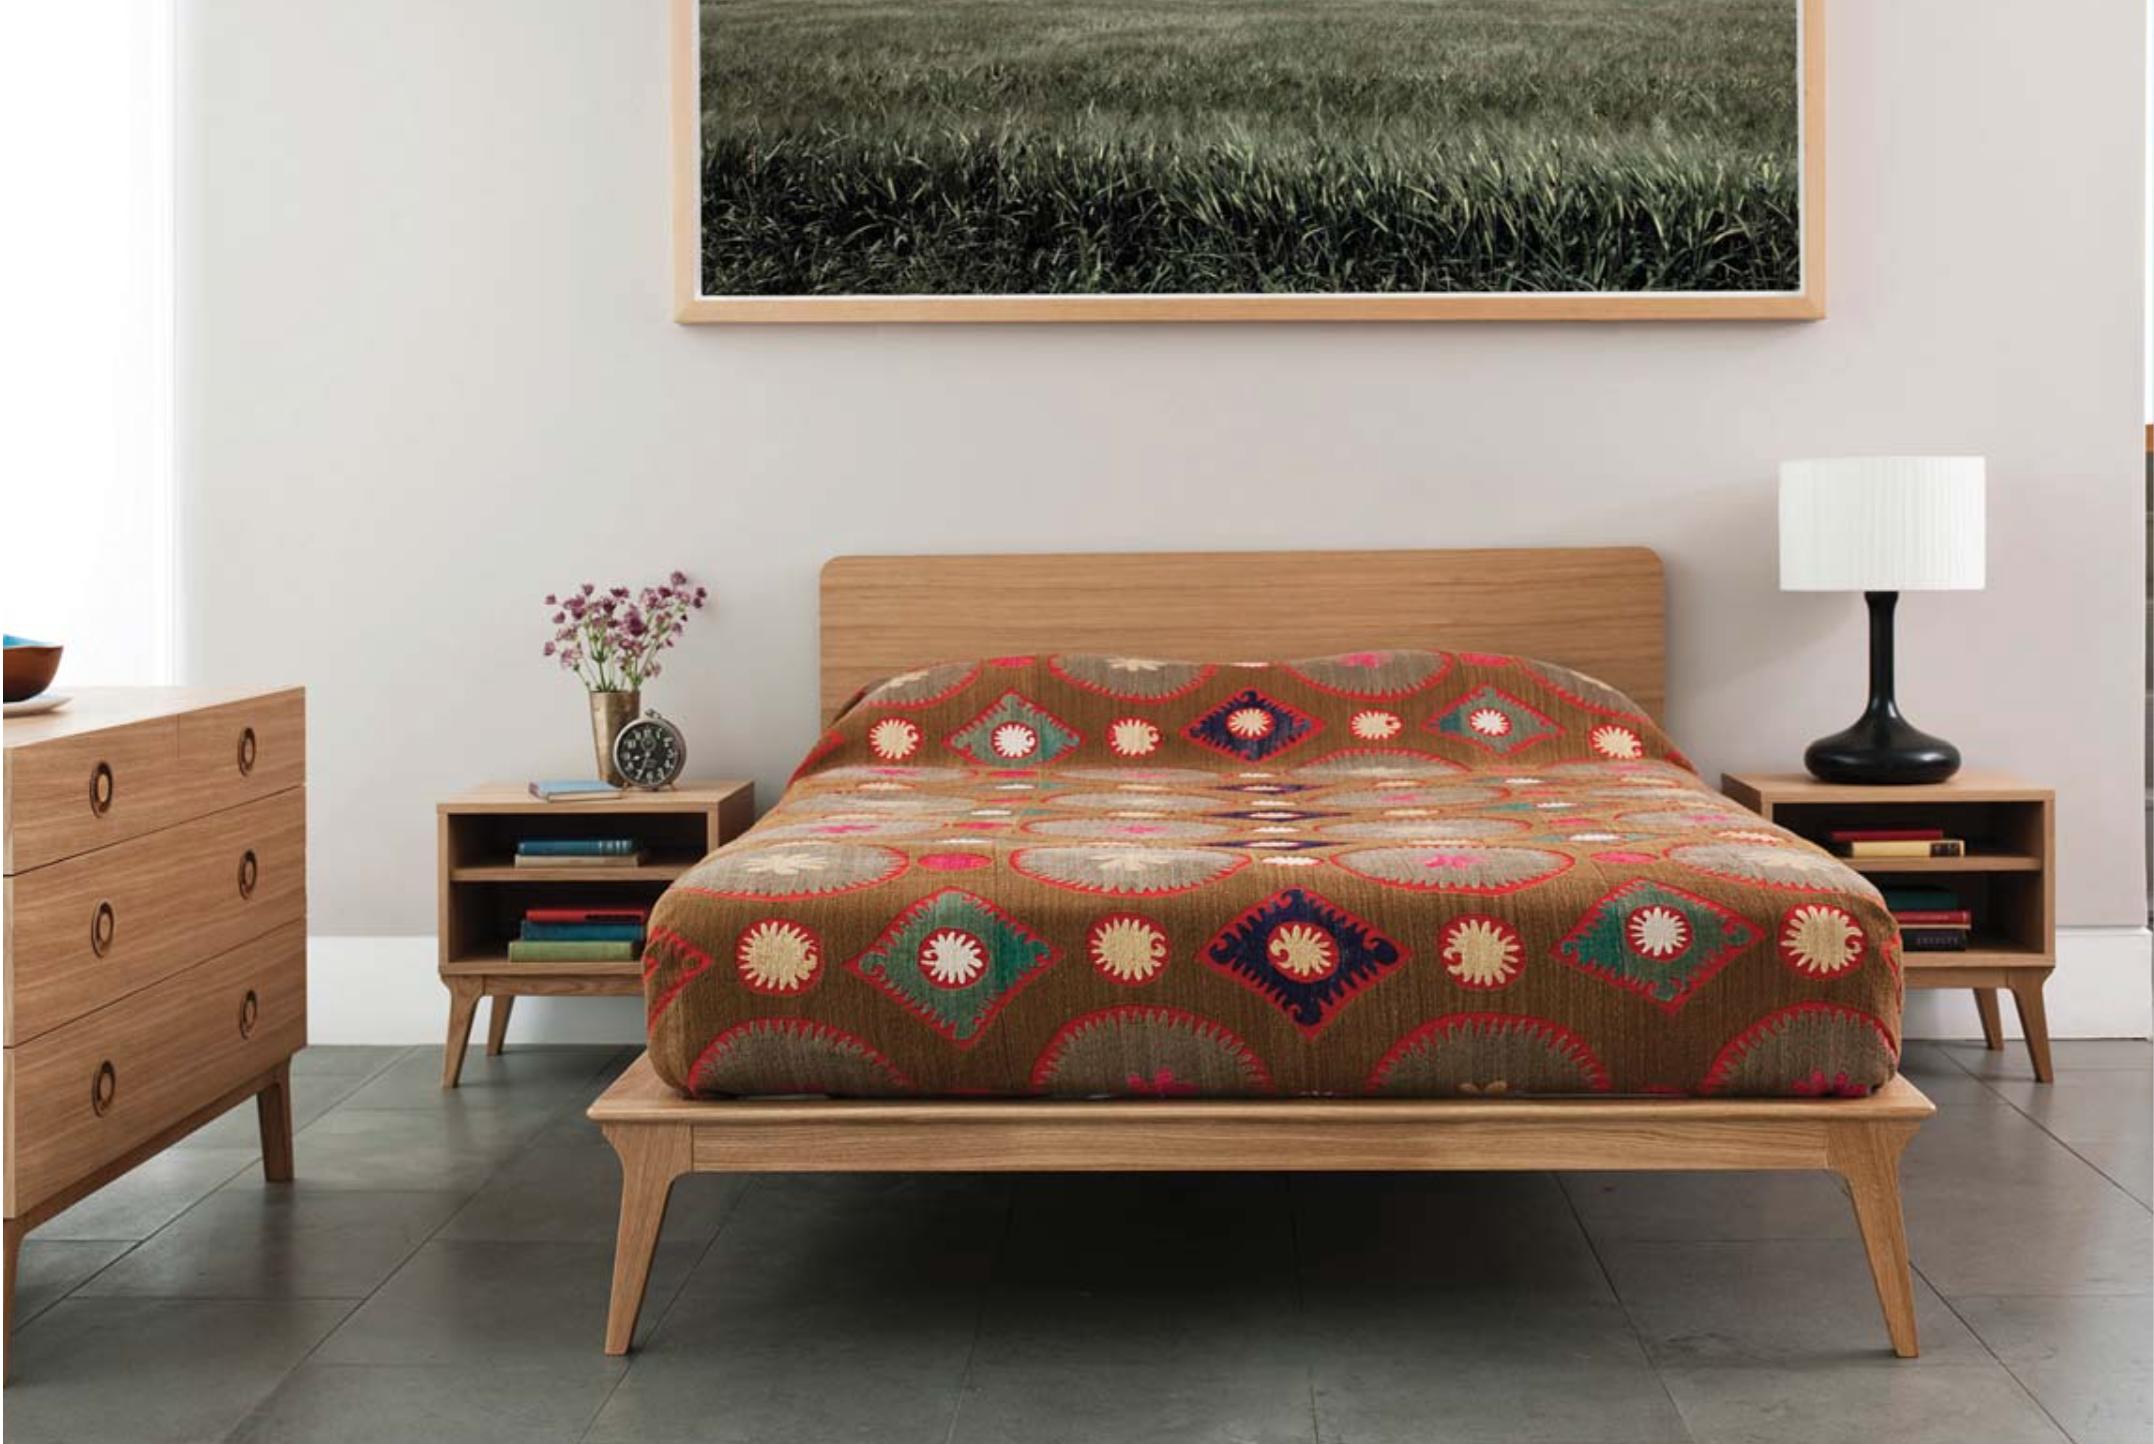 Pin by 设计共和 Design Republic on URBAN CHIC / Bed Room